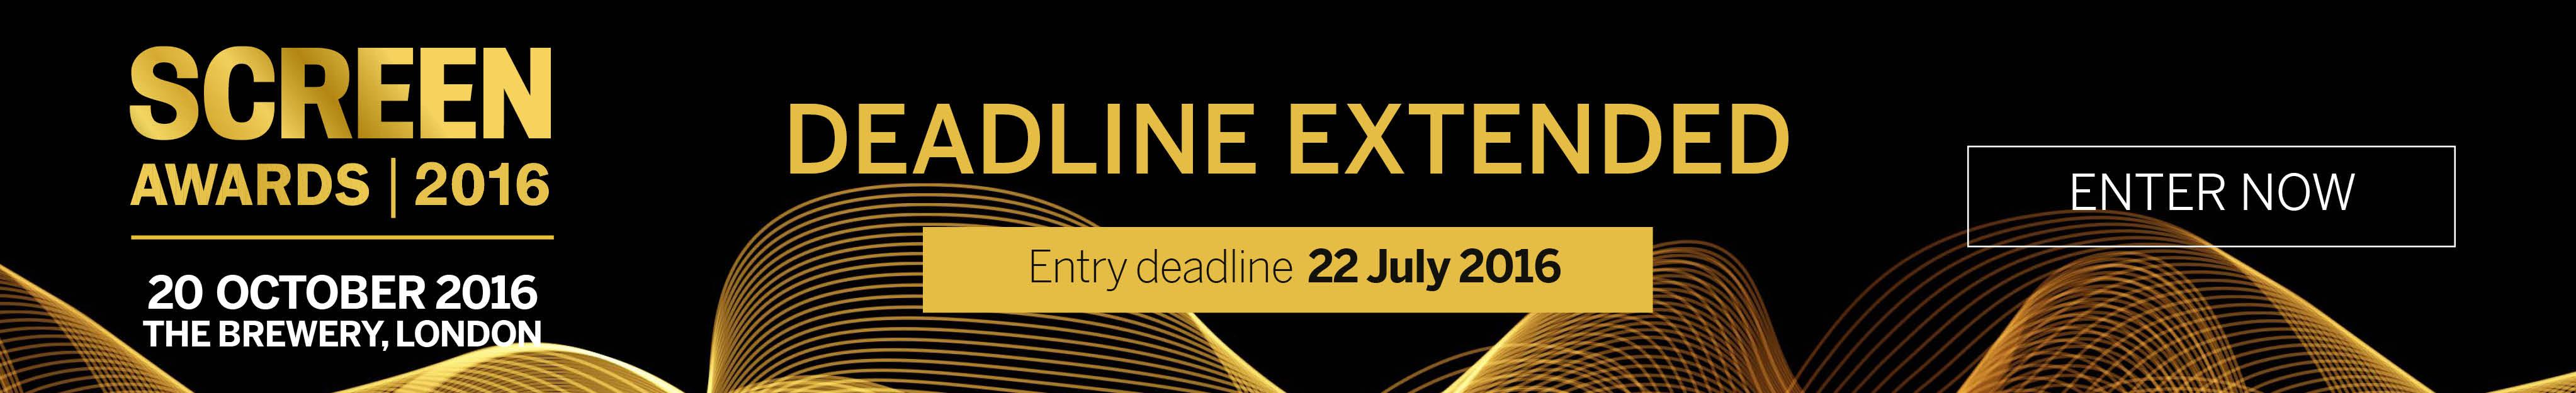 Screen+Awards+2016+banner